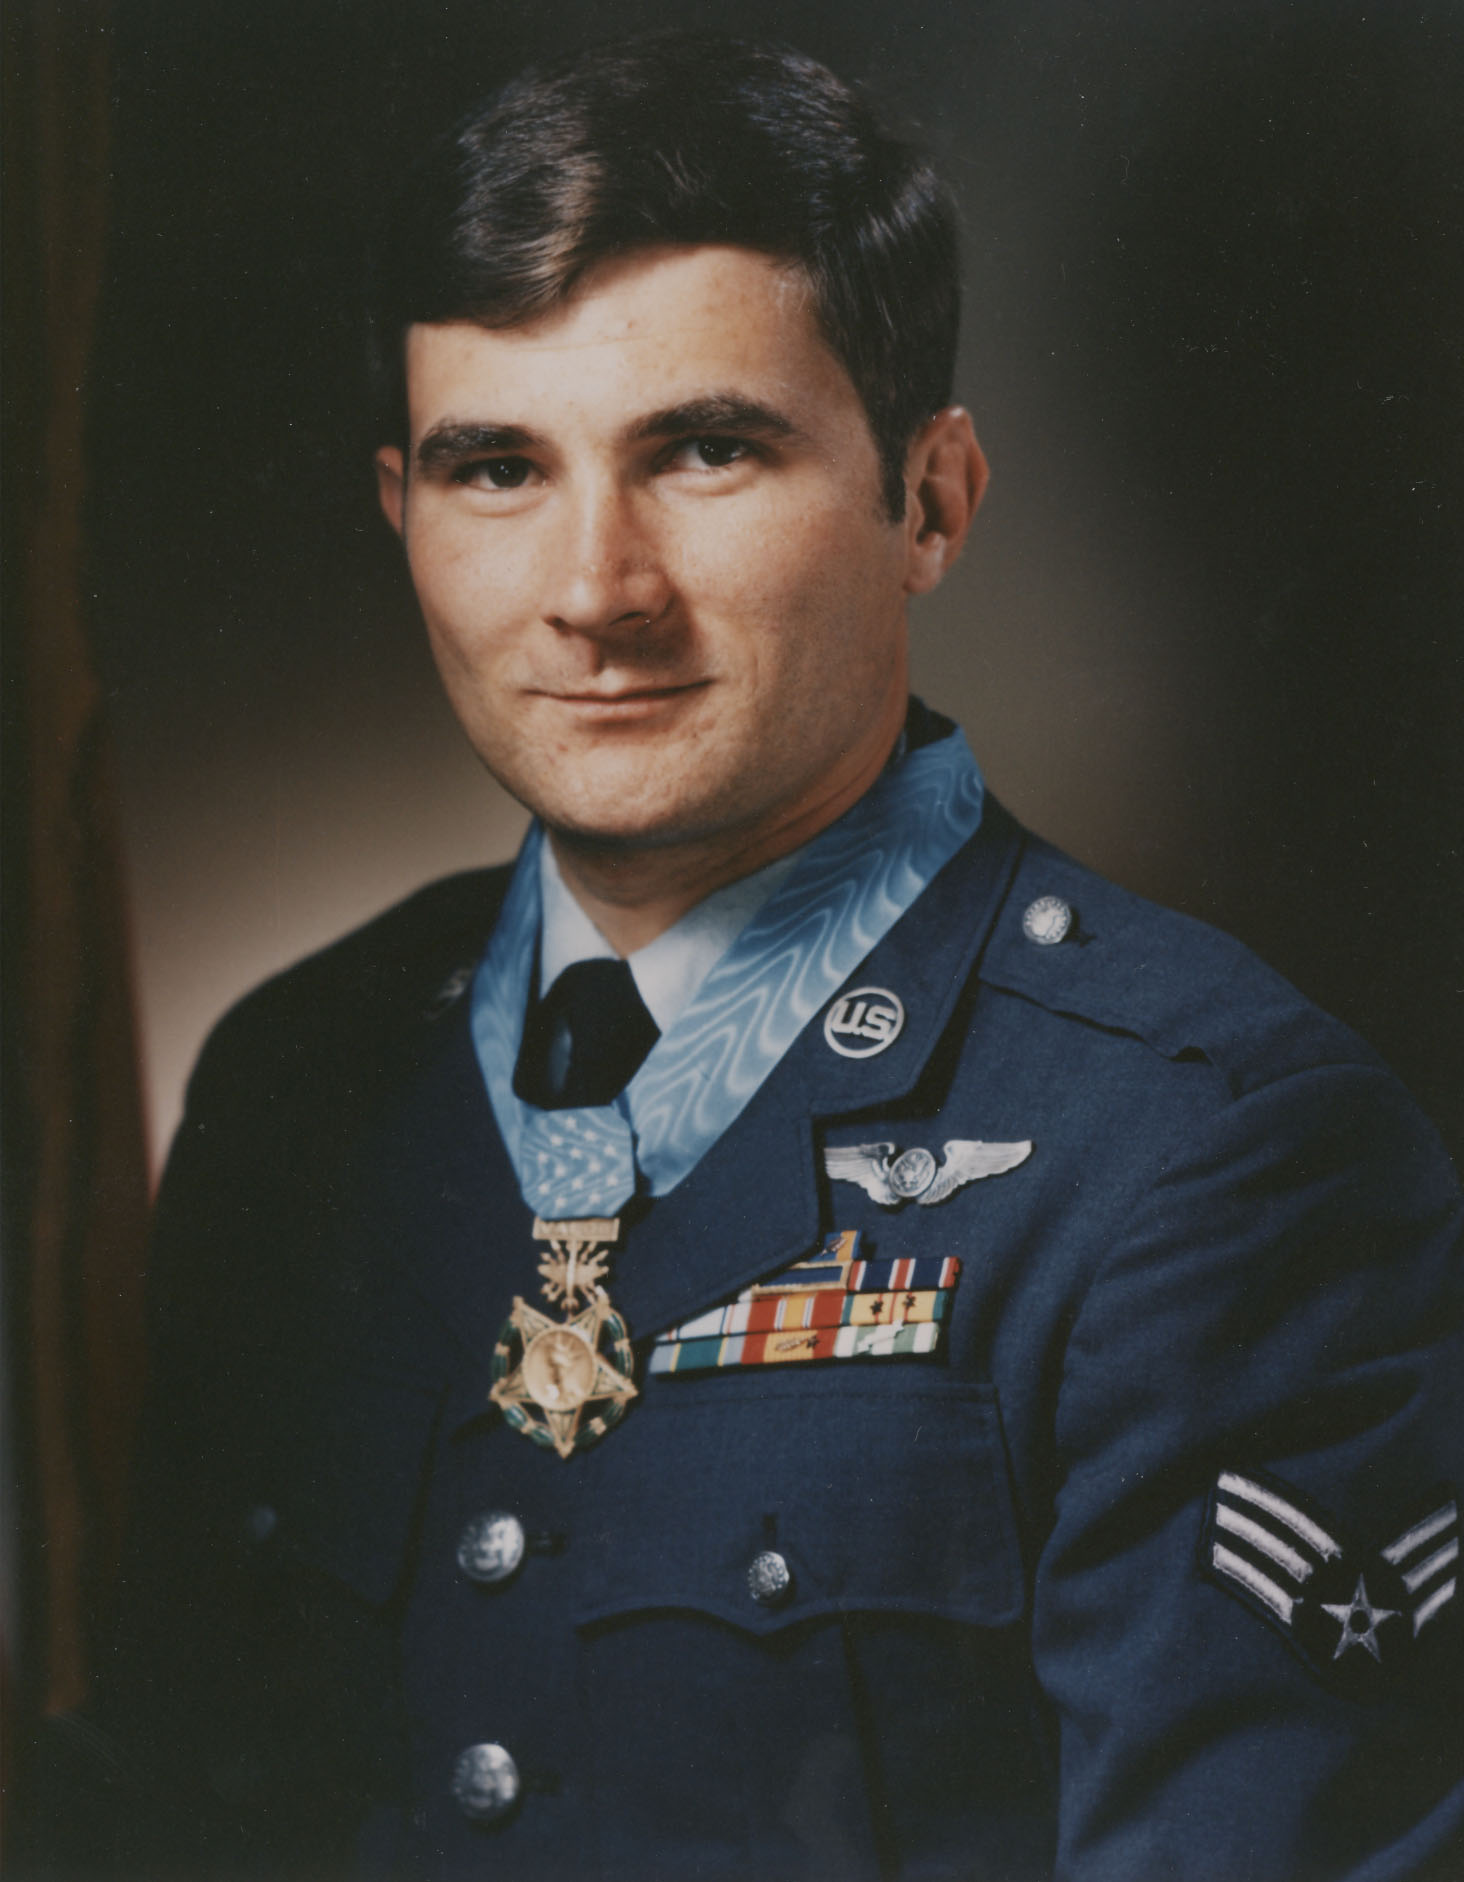 John Levitow